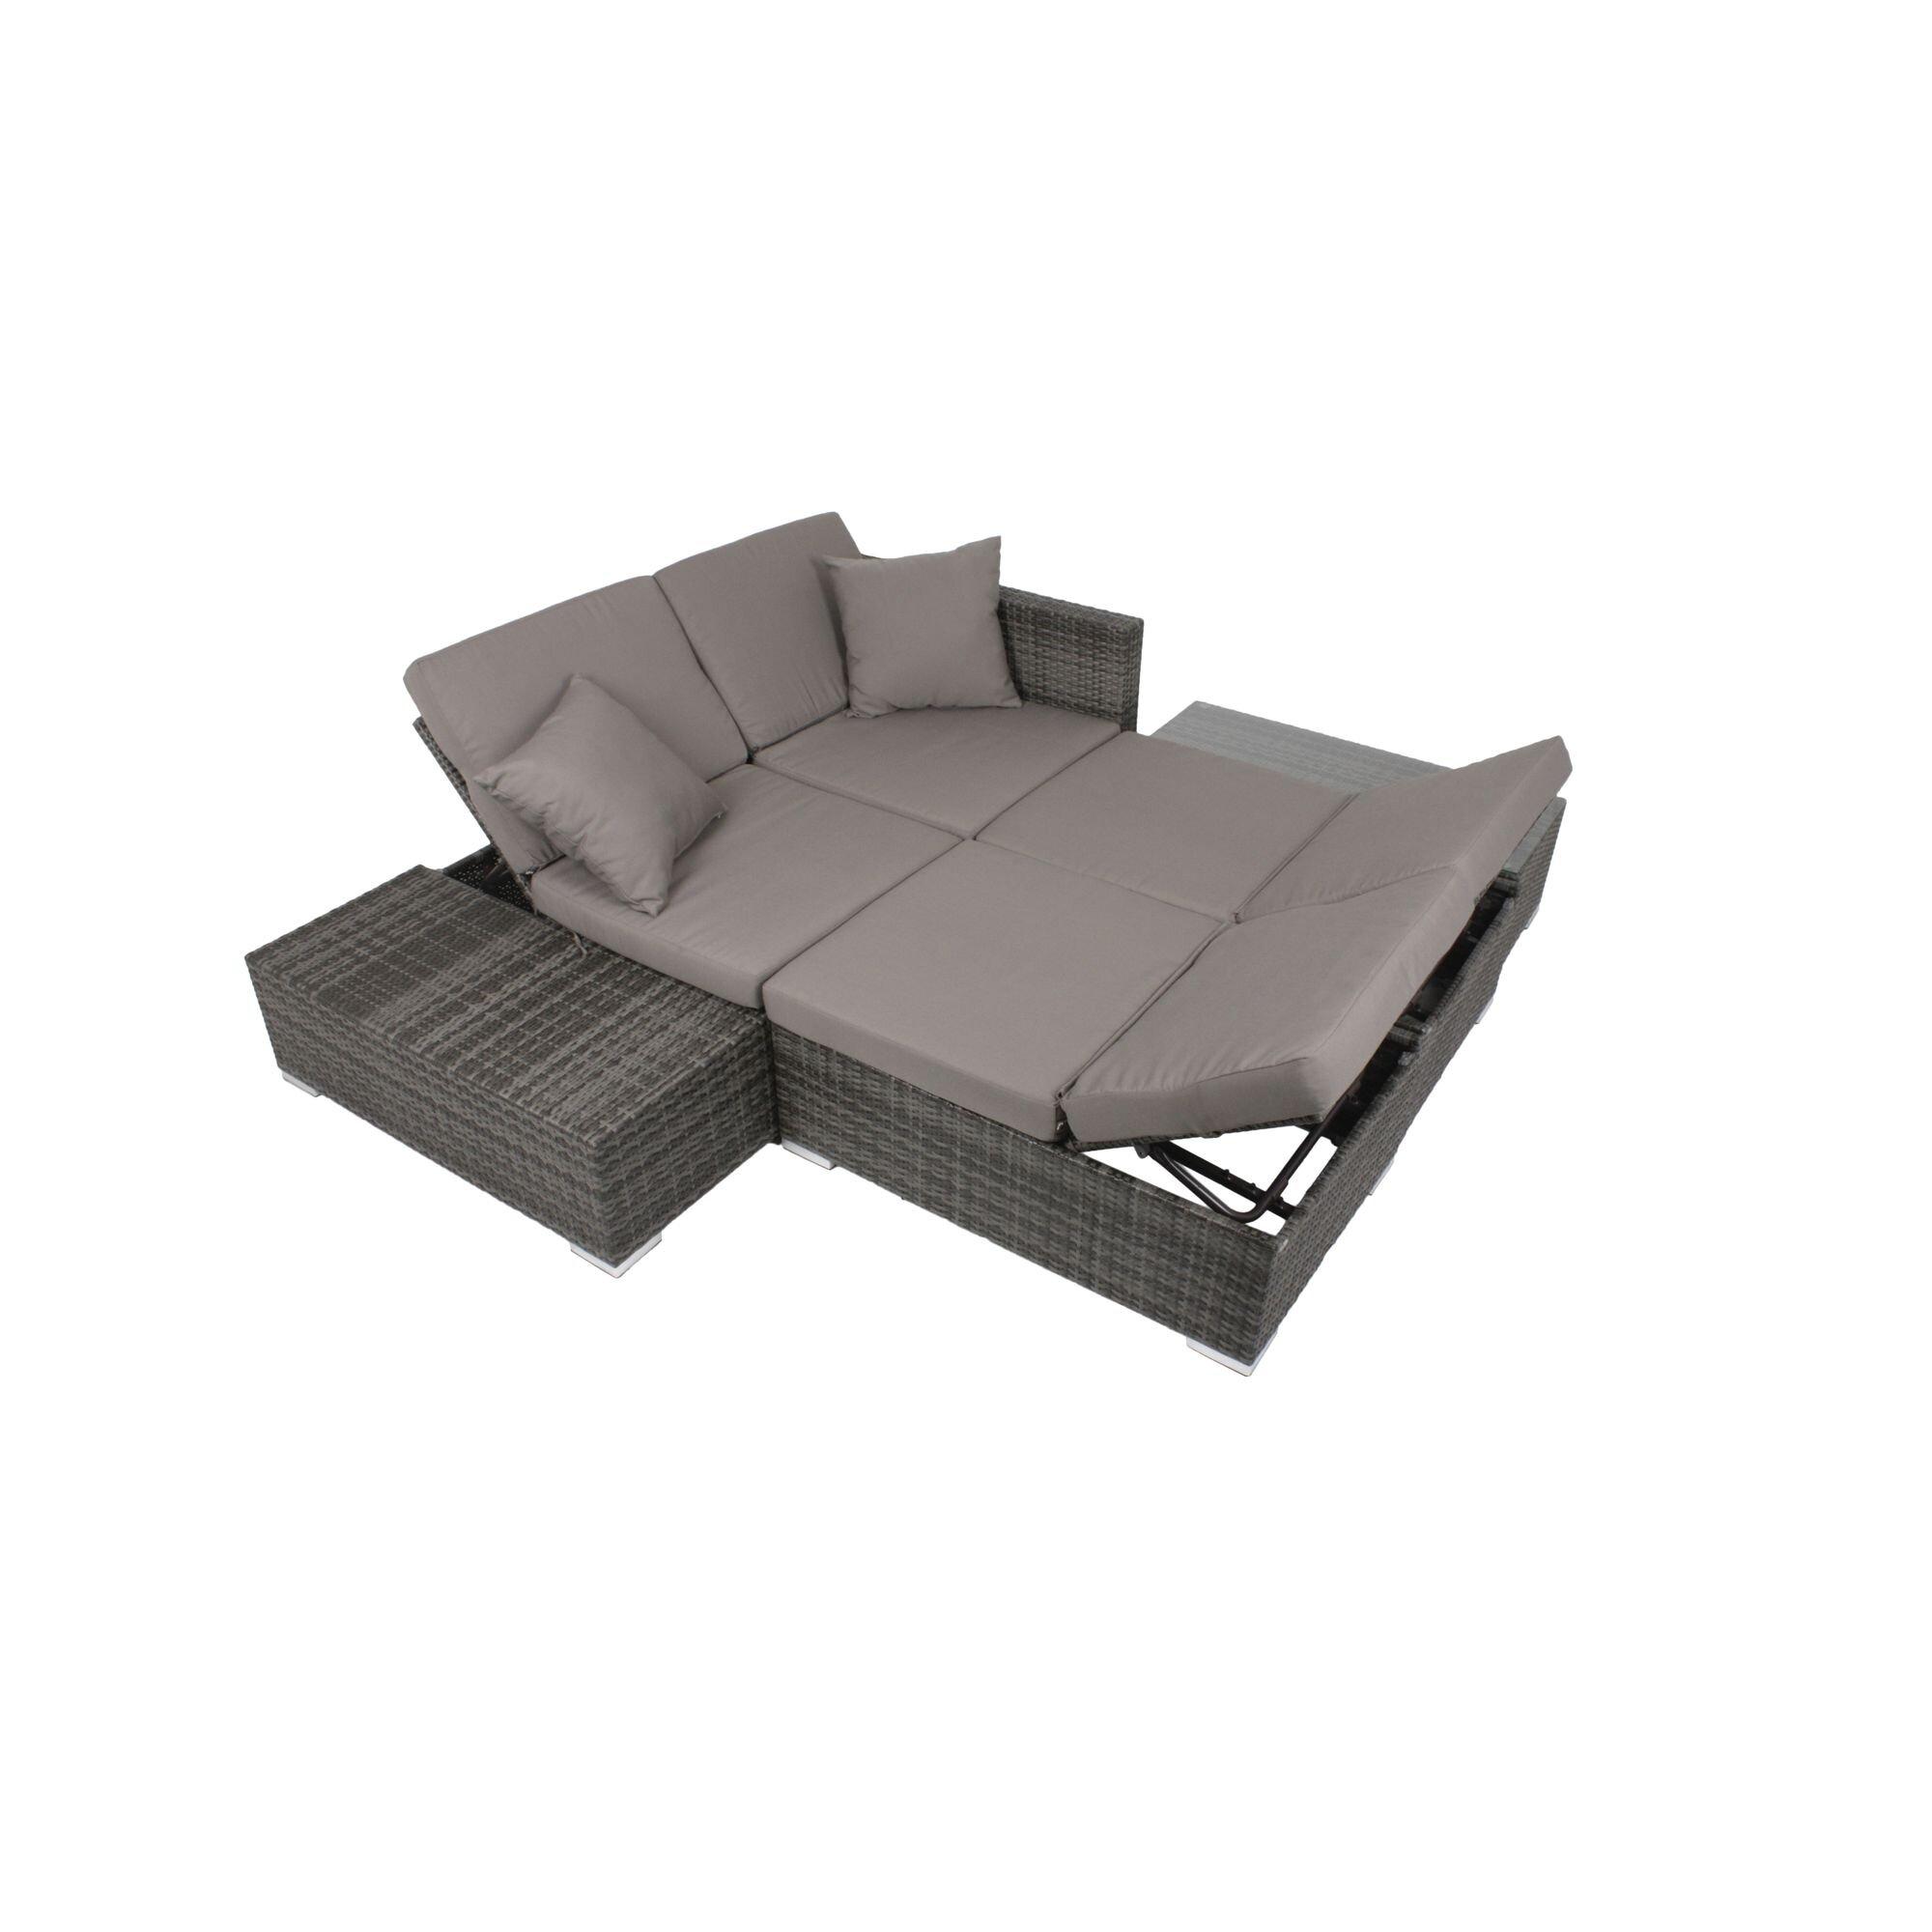 Kampen living 4 sitzer sofa set eva bewertungen for Sofa 4 sitzer